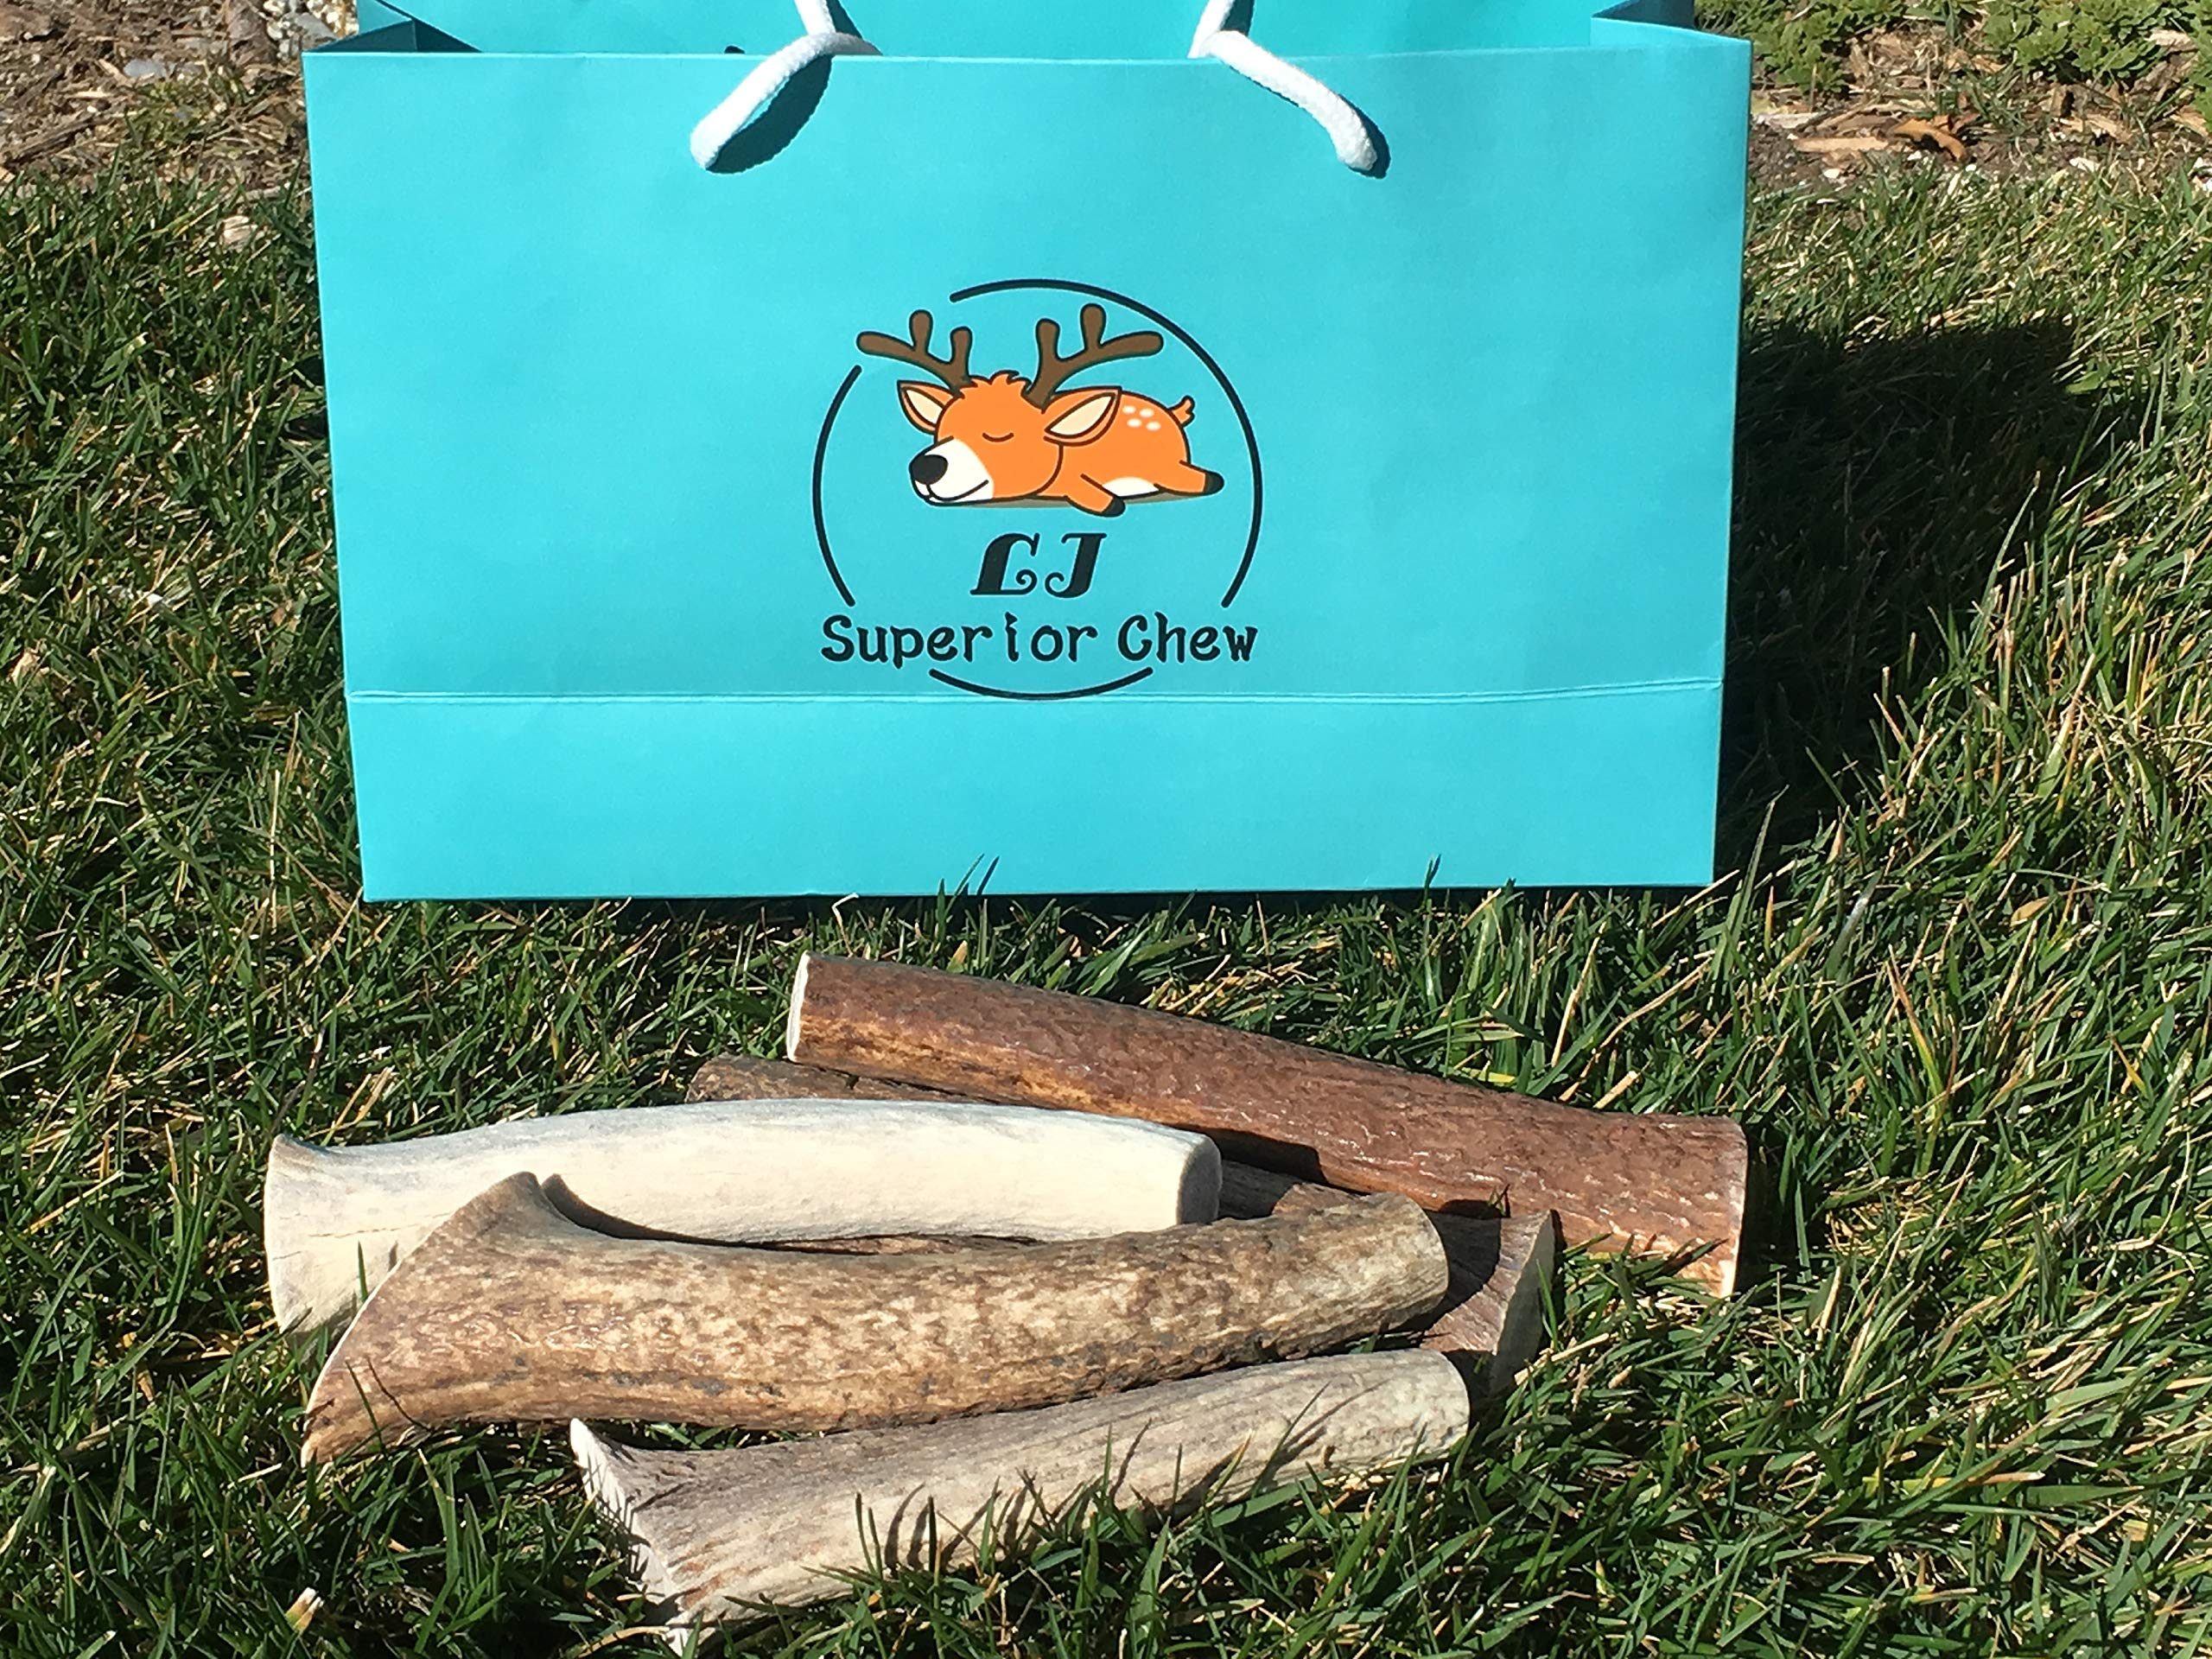 2 Pound Mix-Medium/Large-Extra Lbs Premium Elk & Deer Antler Dog Chew Inner Core by L J Superior Chew